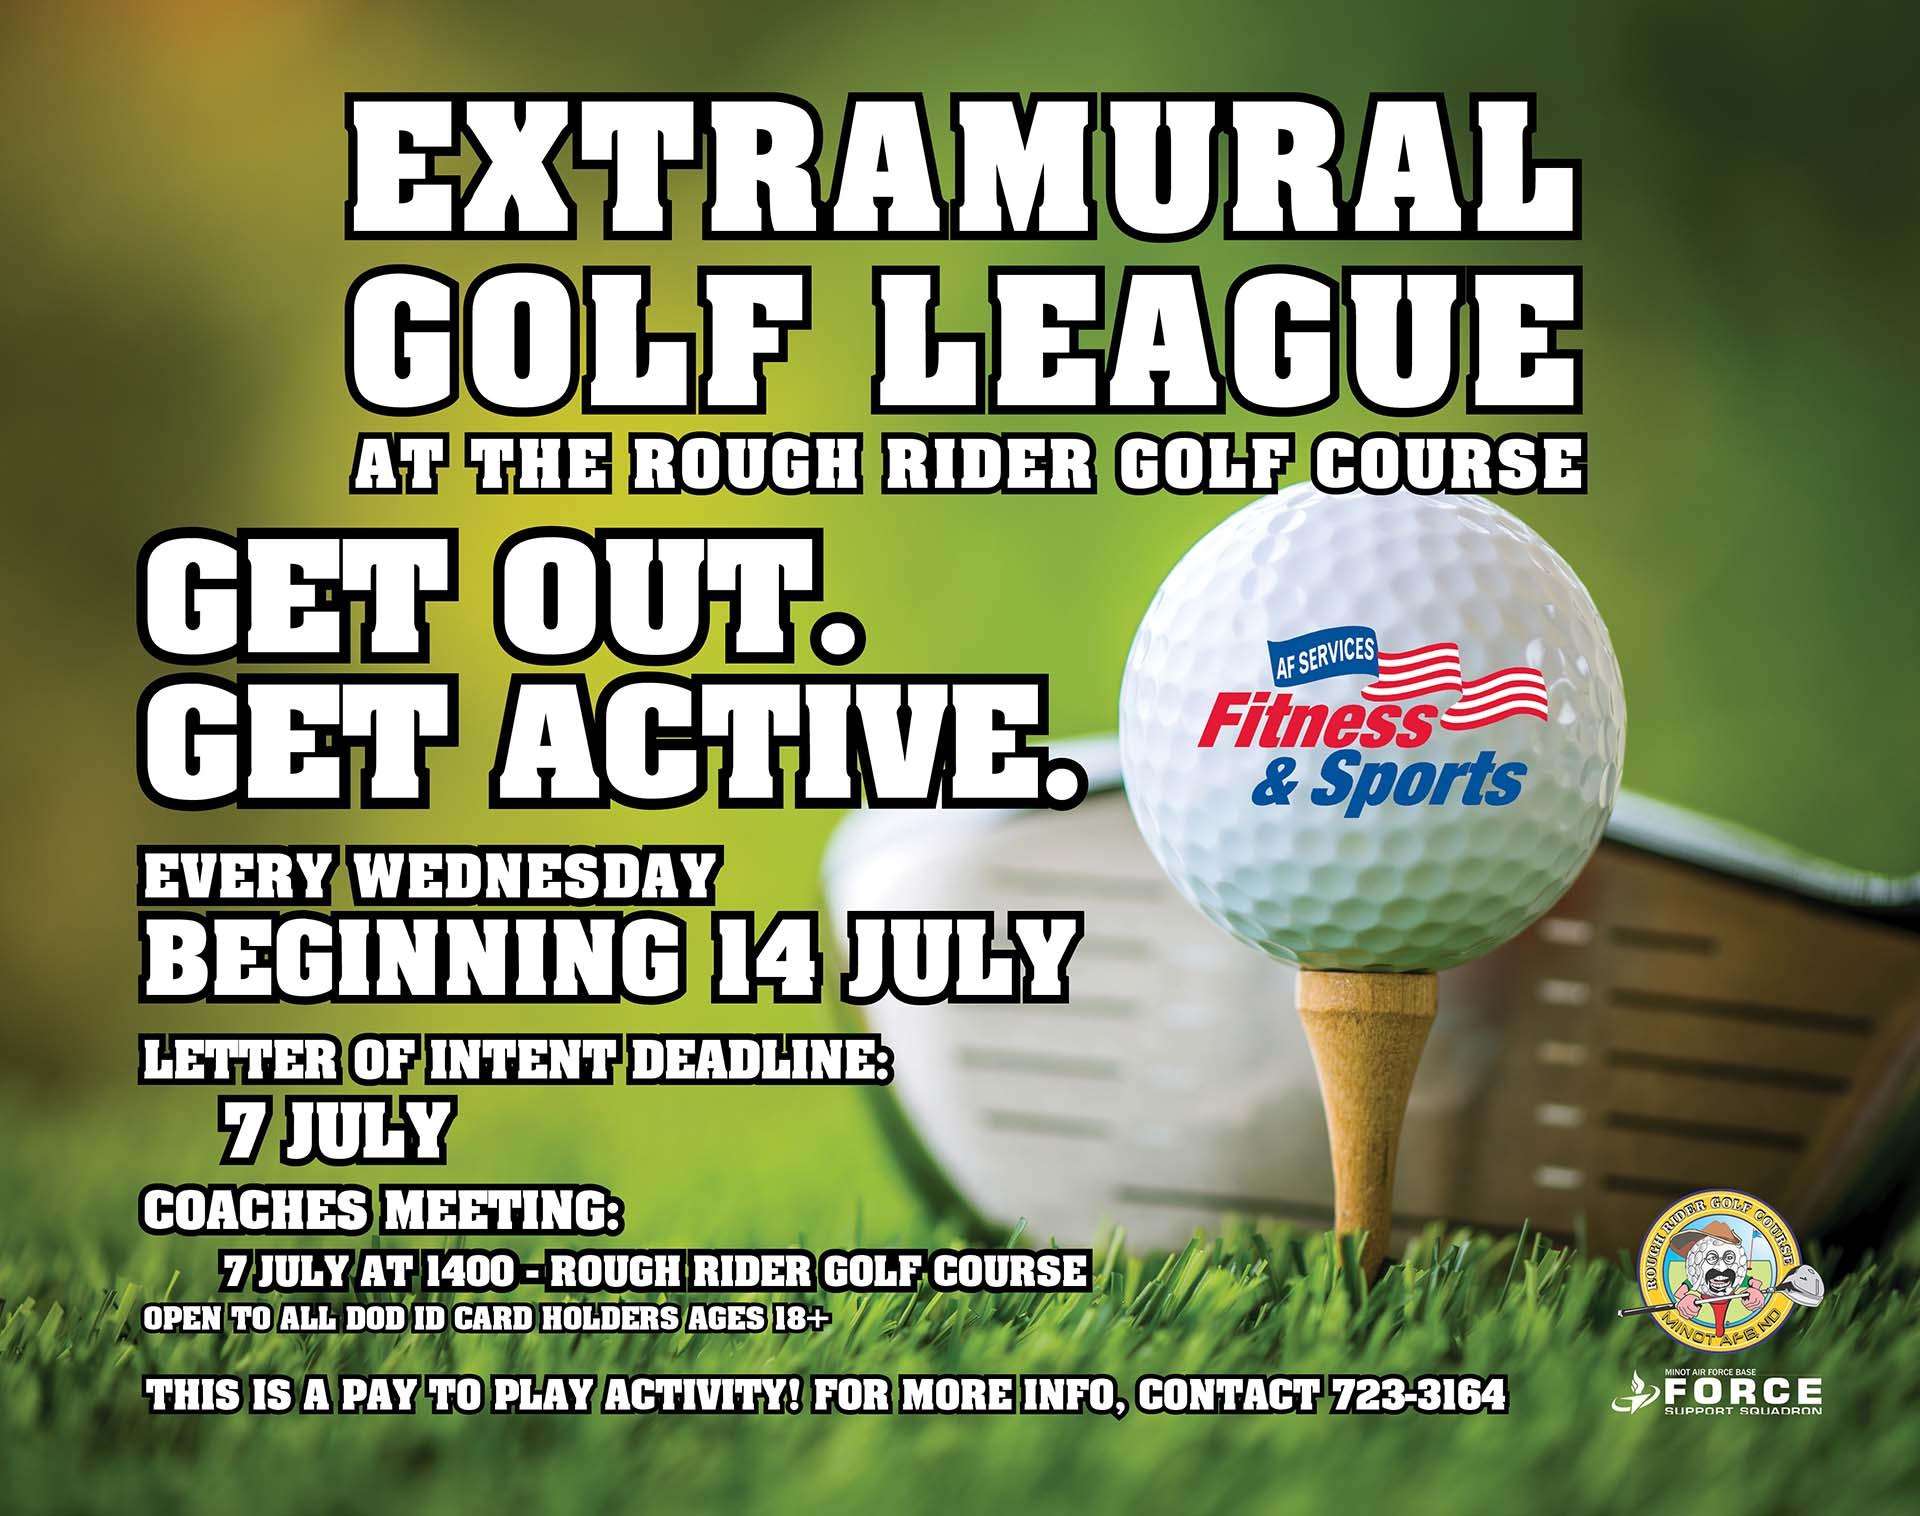 07.07 Extramural Golf